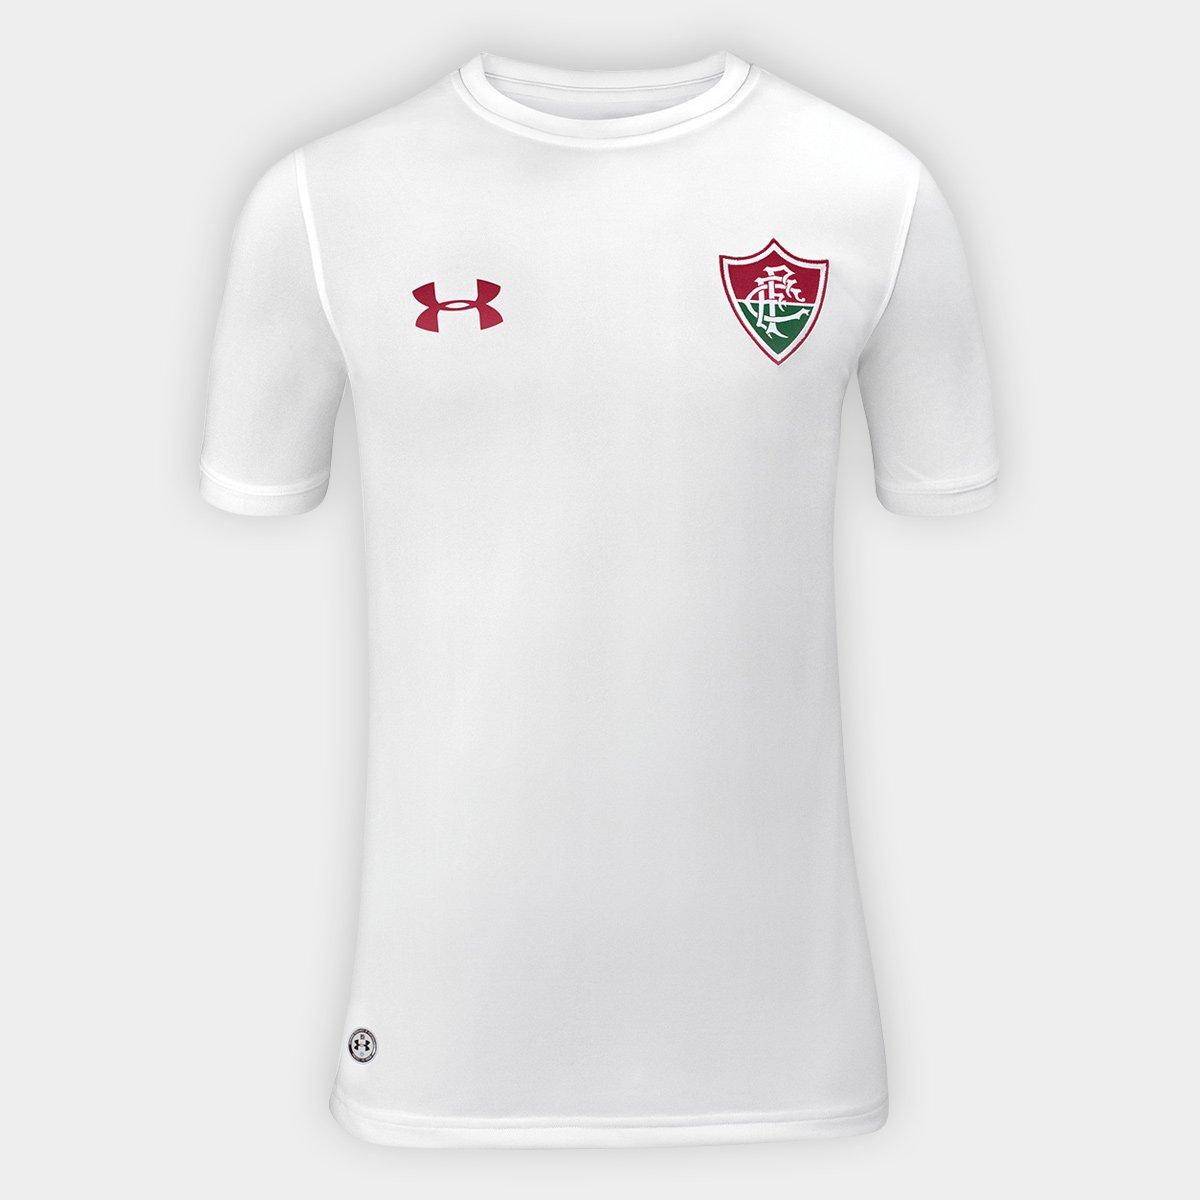 2fc272495e ... Camisa Fluminense II 17 18 P.H. Ganso nº 10 Torcedor Under Armour  Masculina